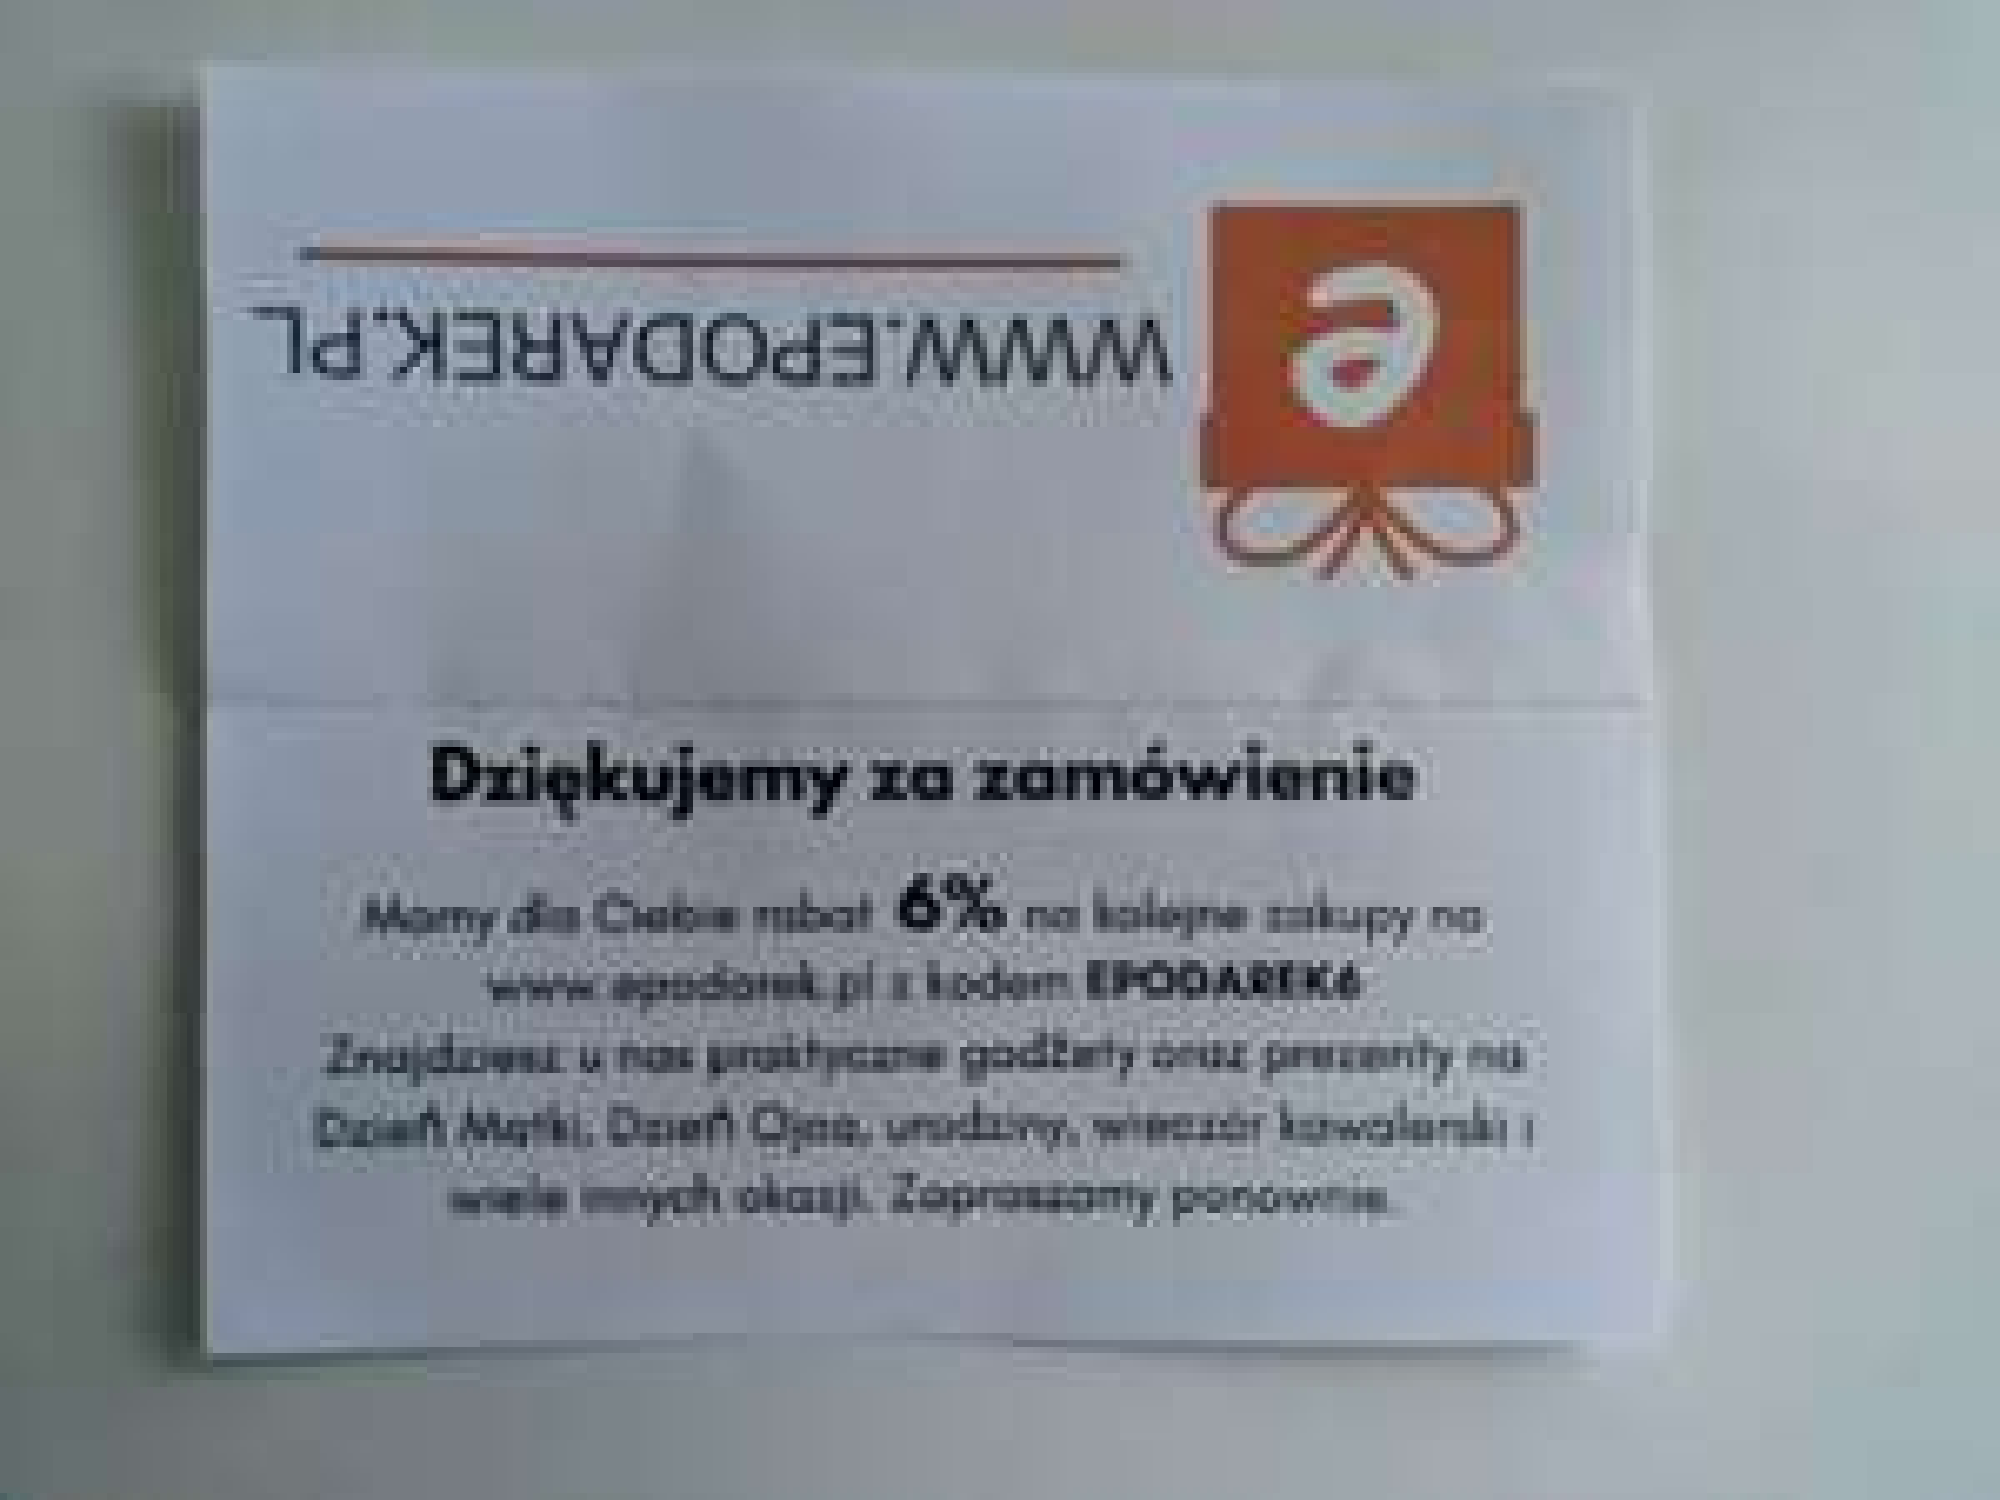 Rabat 6% w sklepie Epodarek.pl